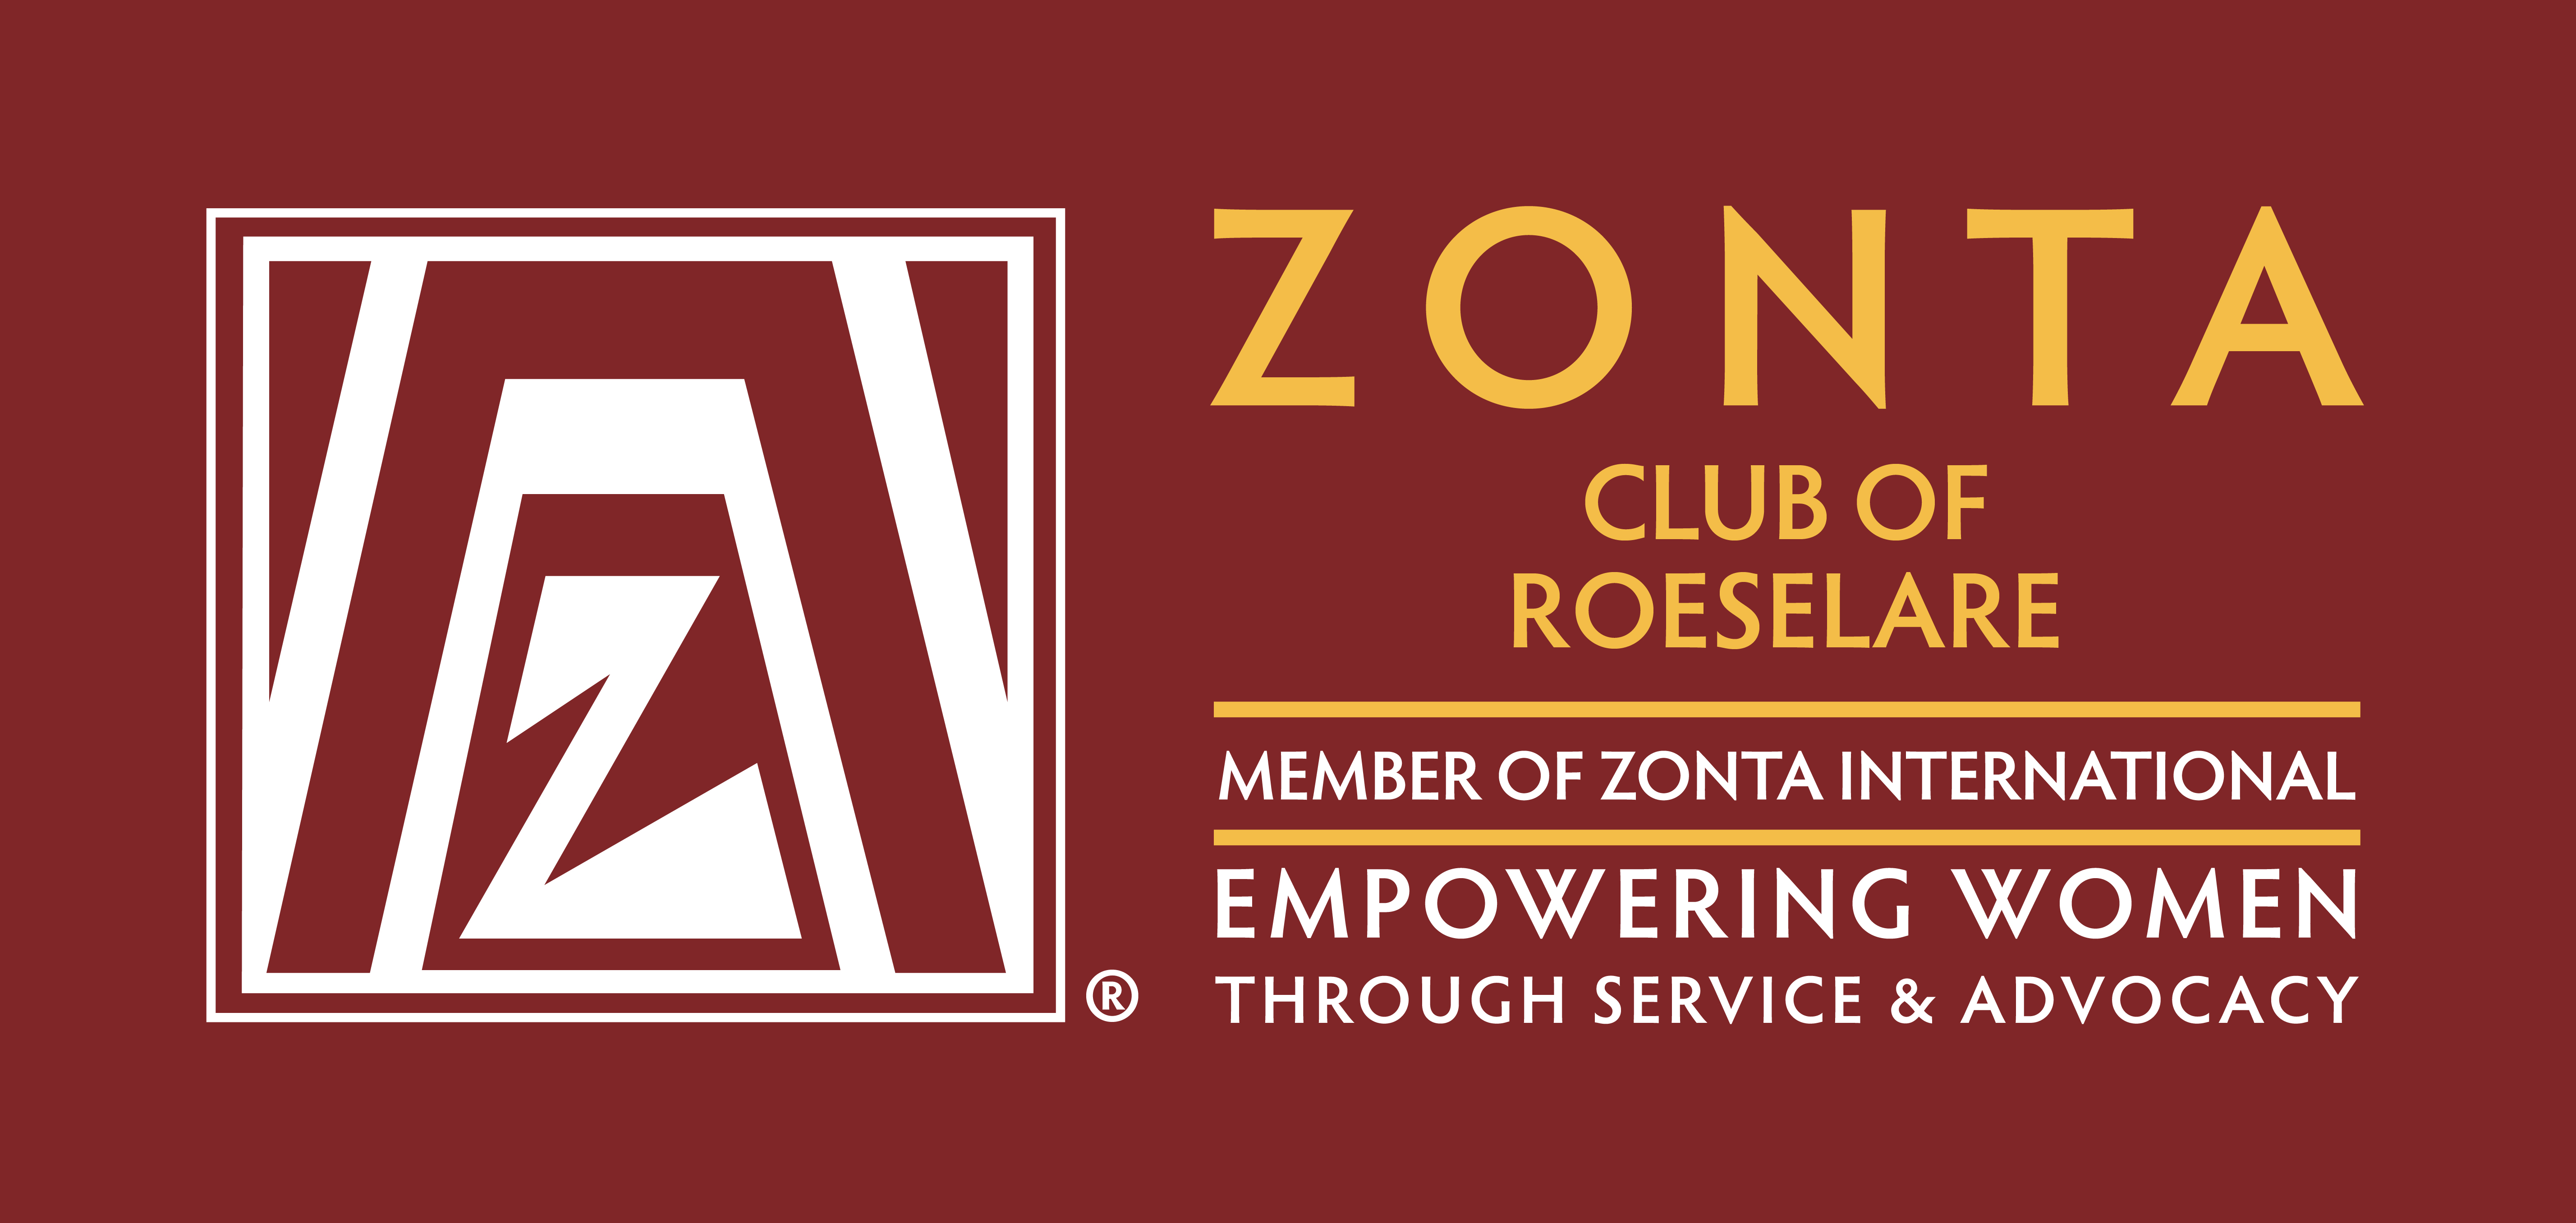 Goud Zonta Club